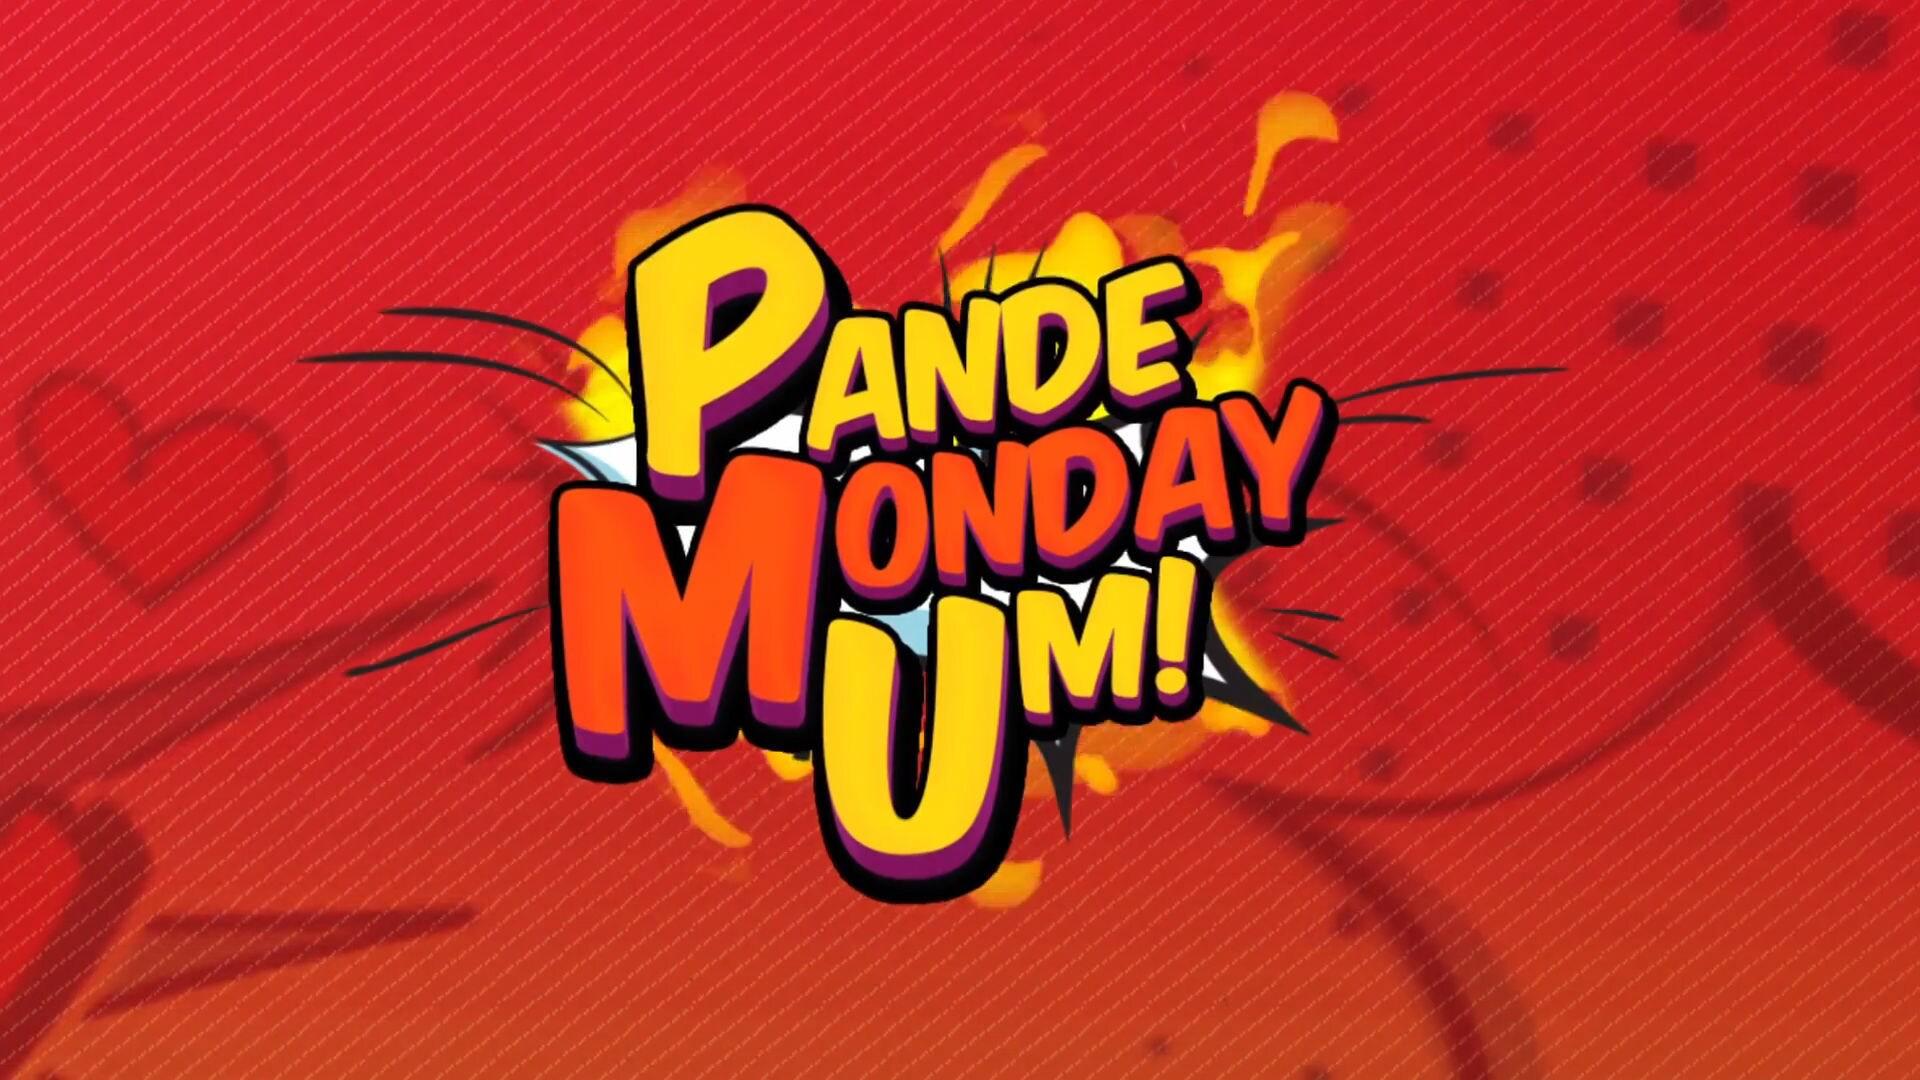 Pande Monday Um!